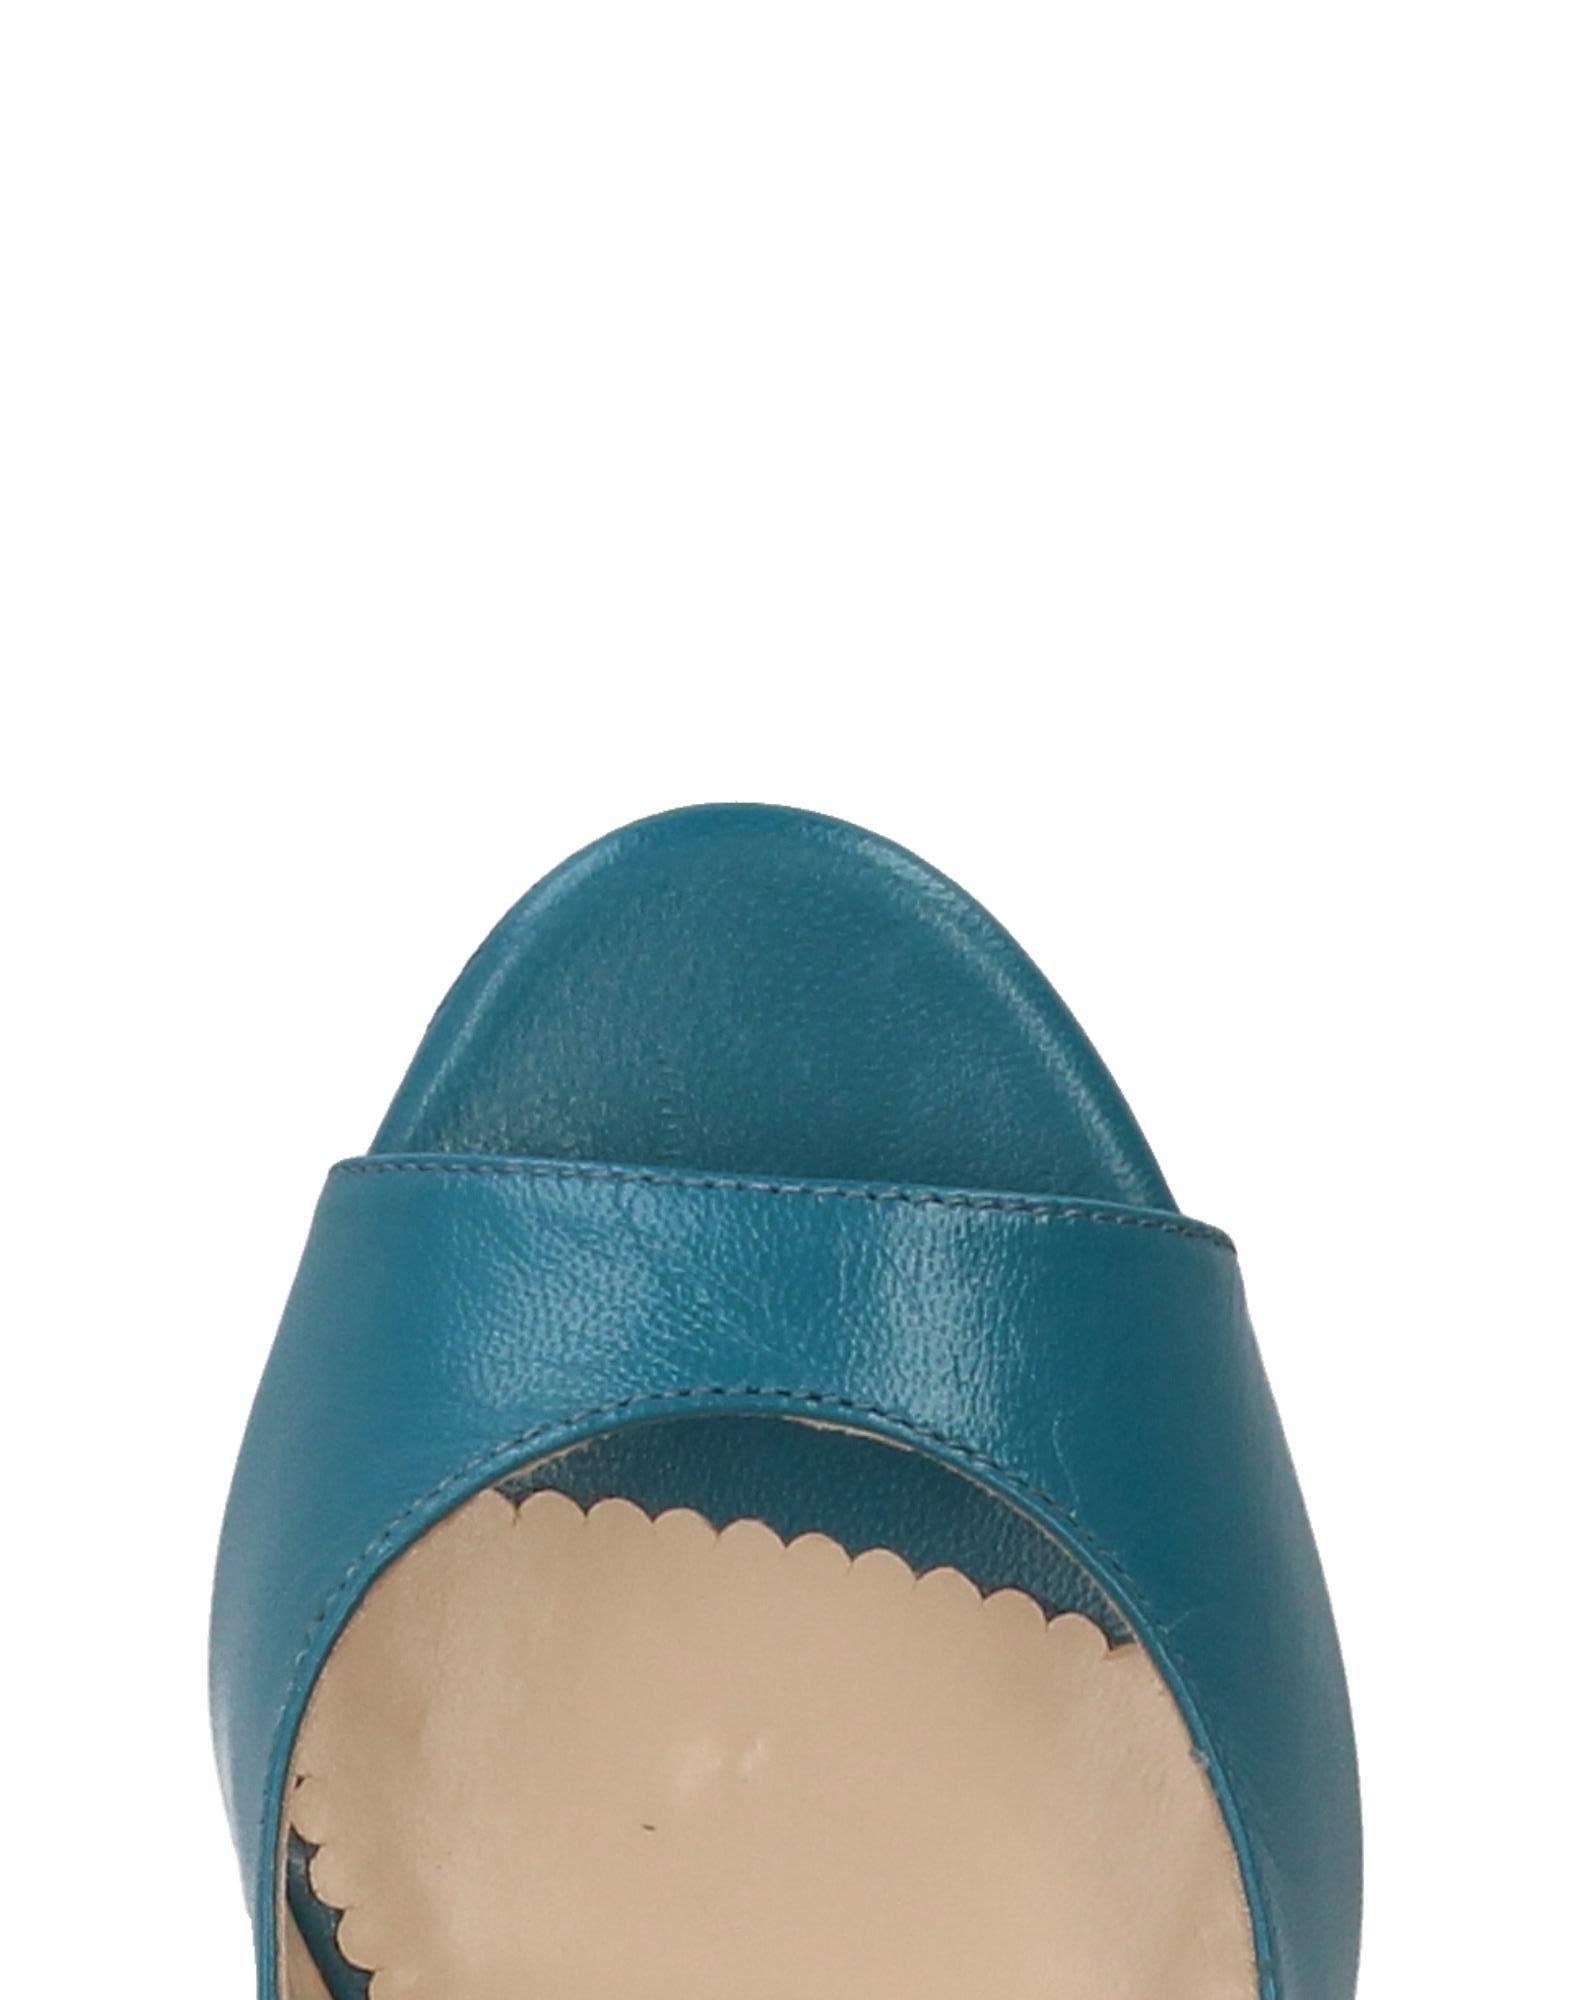 Gut um billige billige billige Schuhe zu tragenL' Autre Chose Pumps Damen  11189002VB 5b4e4f